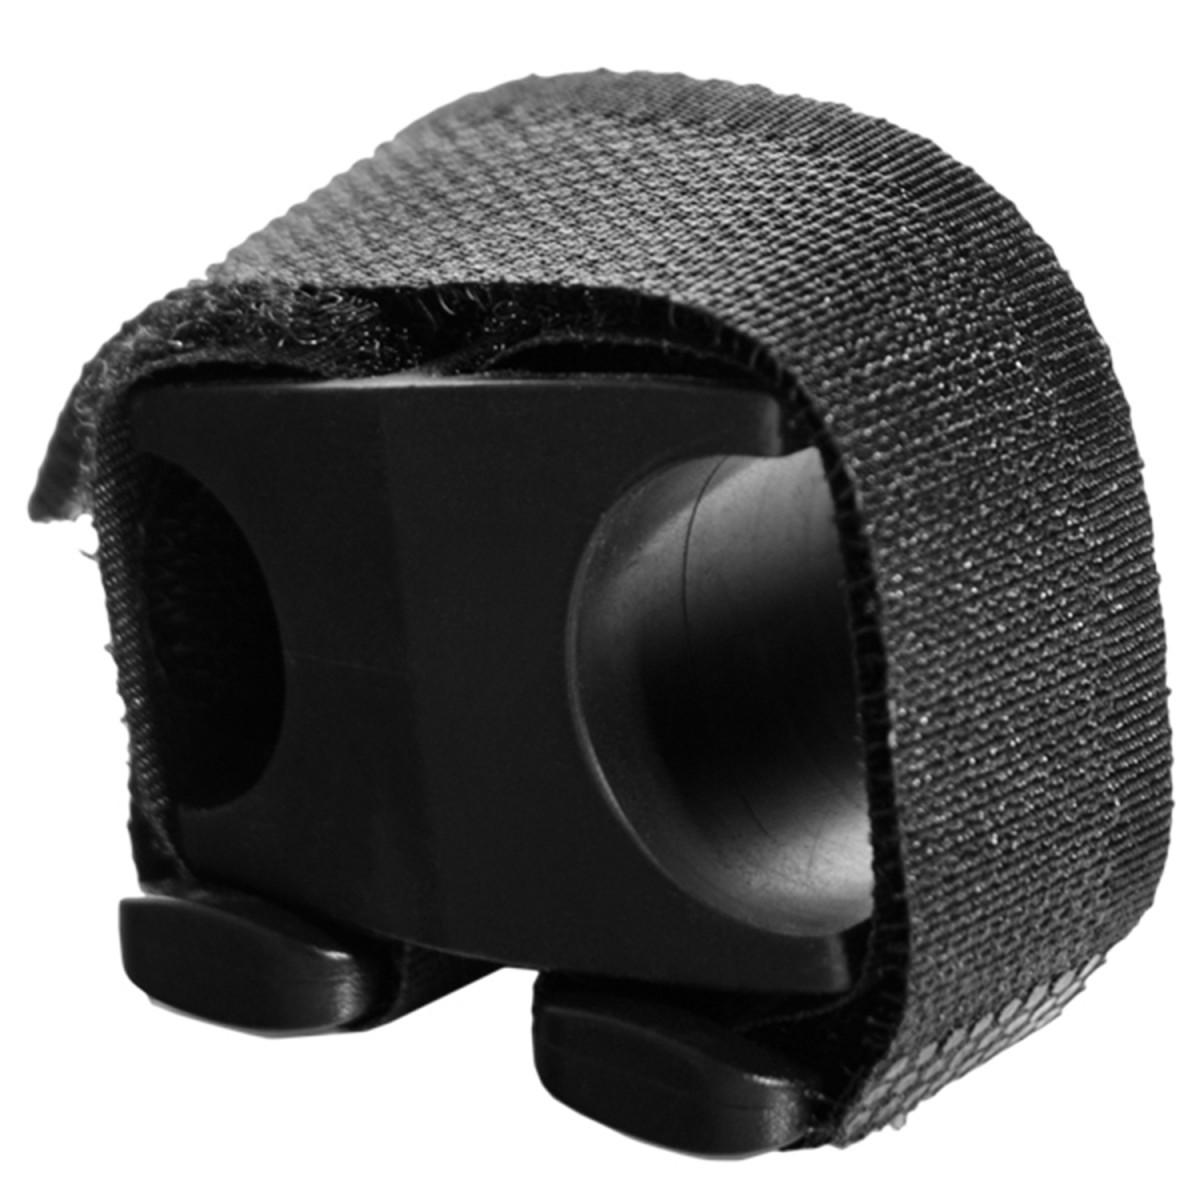 Велокрепление BM-02 (липучка на шлем)